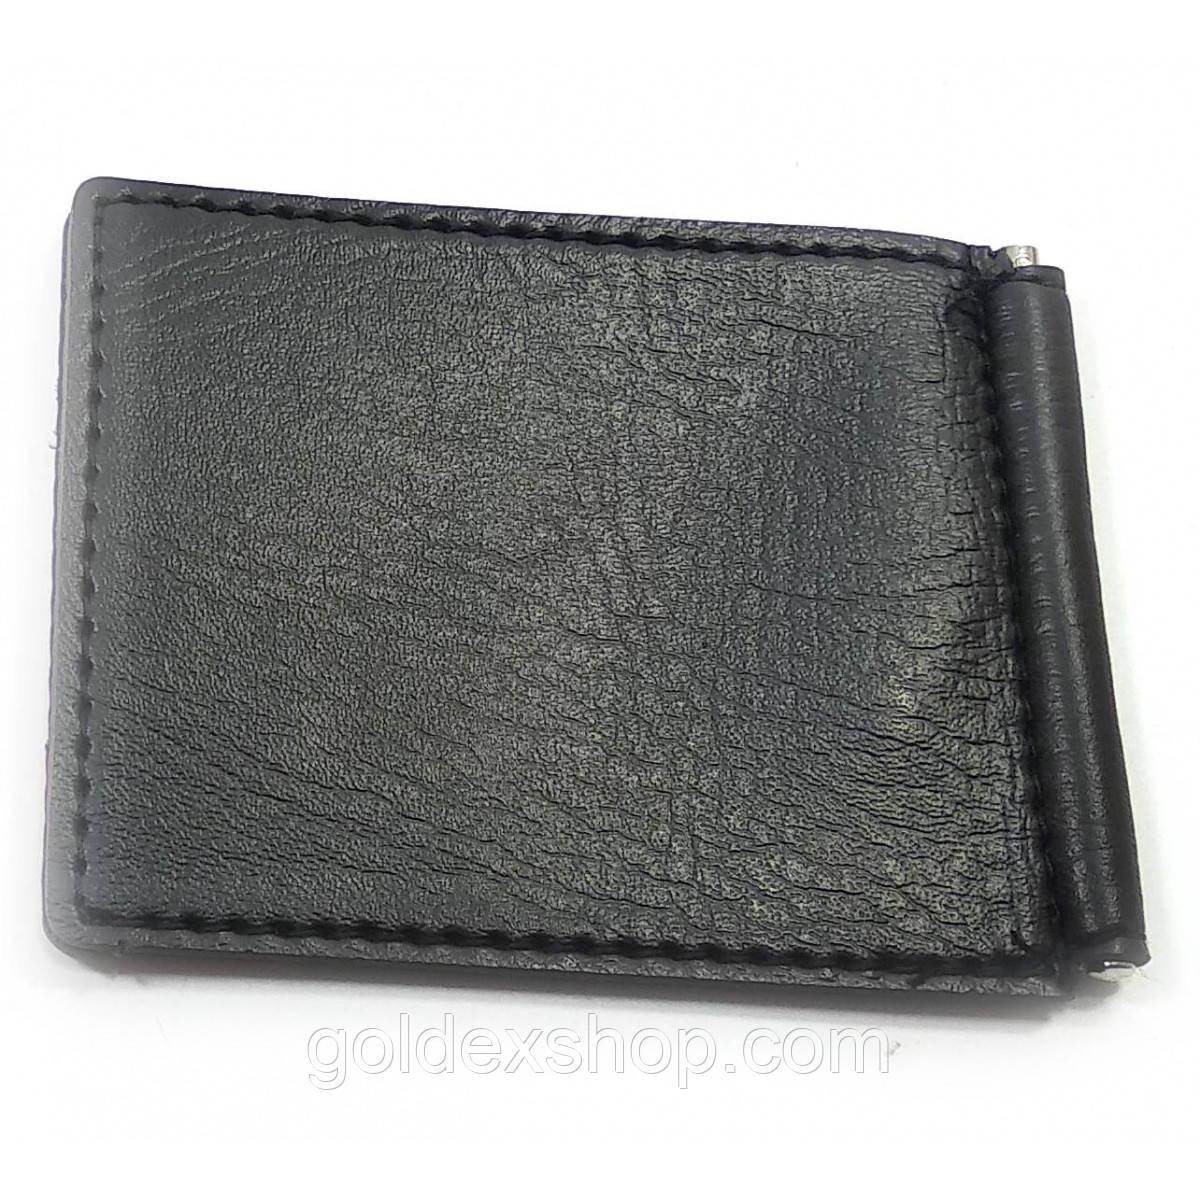 Зажим для денег -бумажник (металл-кожа) (11х8,5х0,5 см)